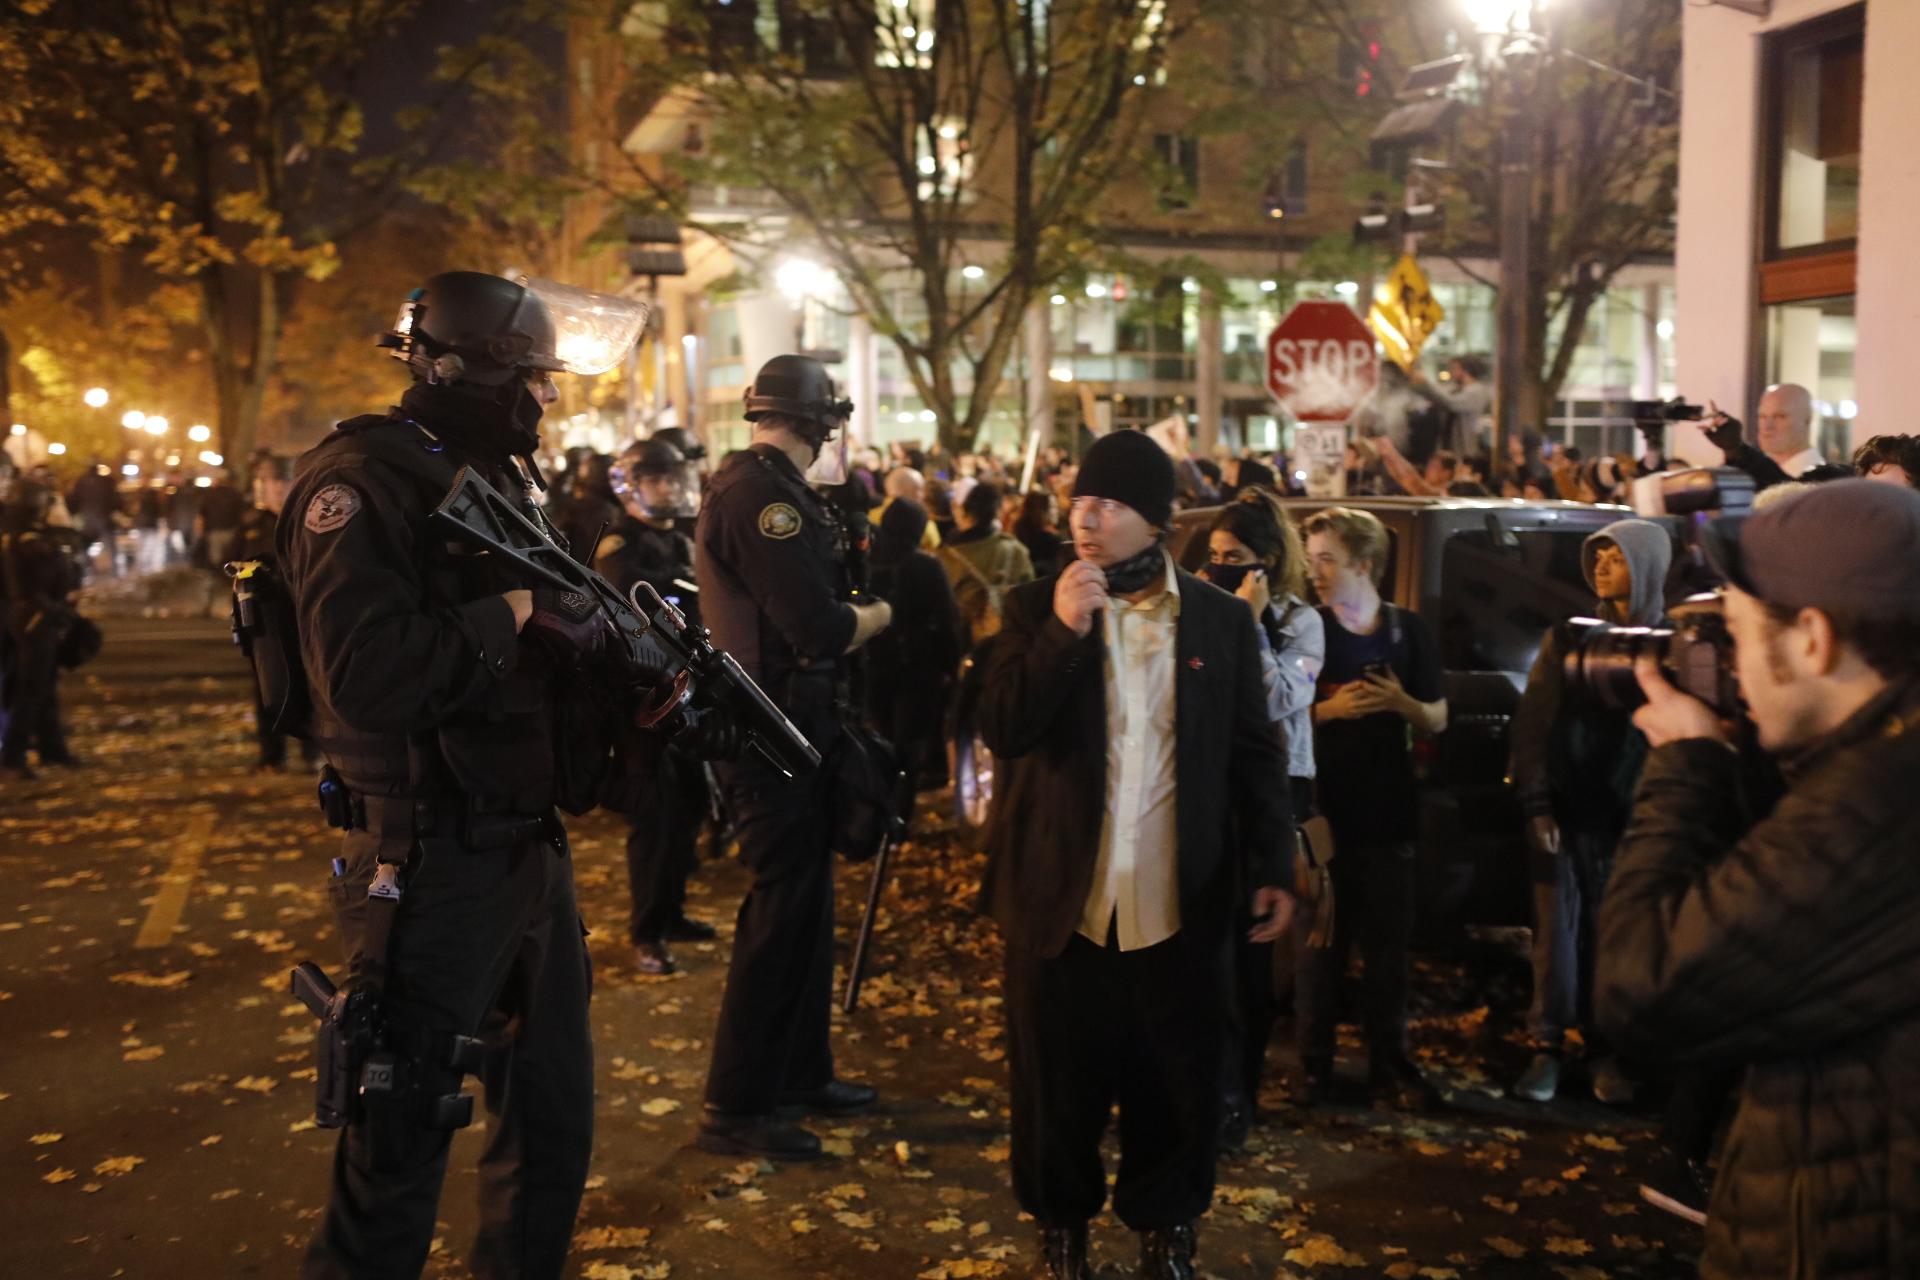 Anti-Trump protest on Nov. 10, 2016. (Christopher Onstott)